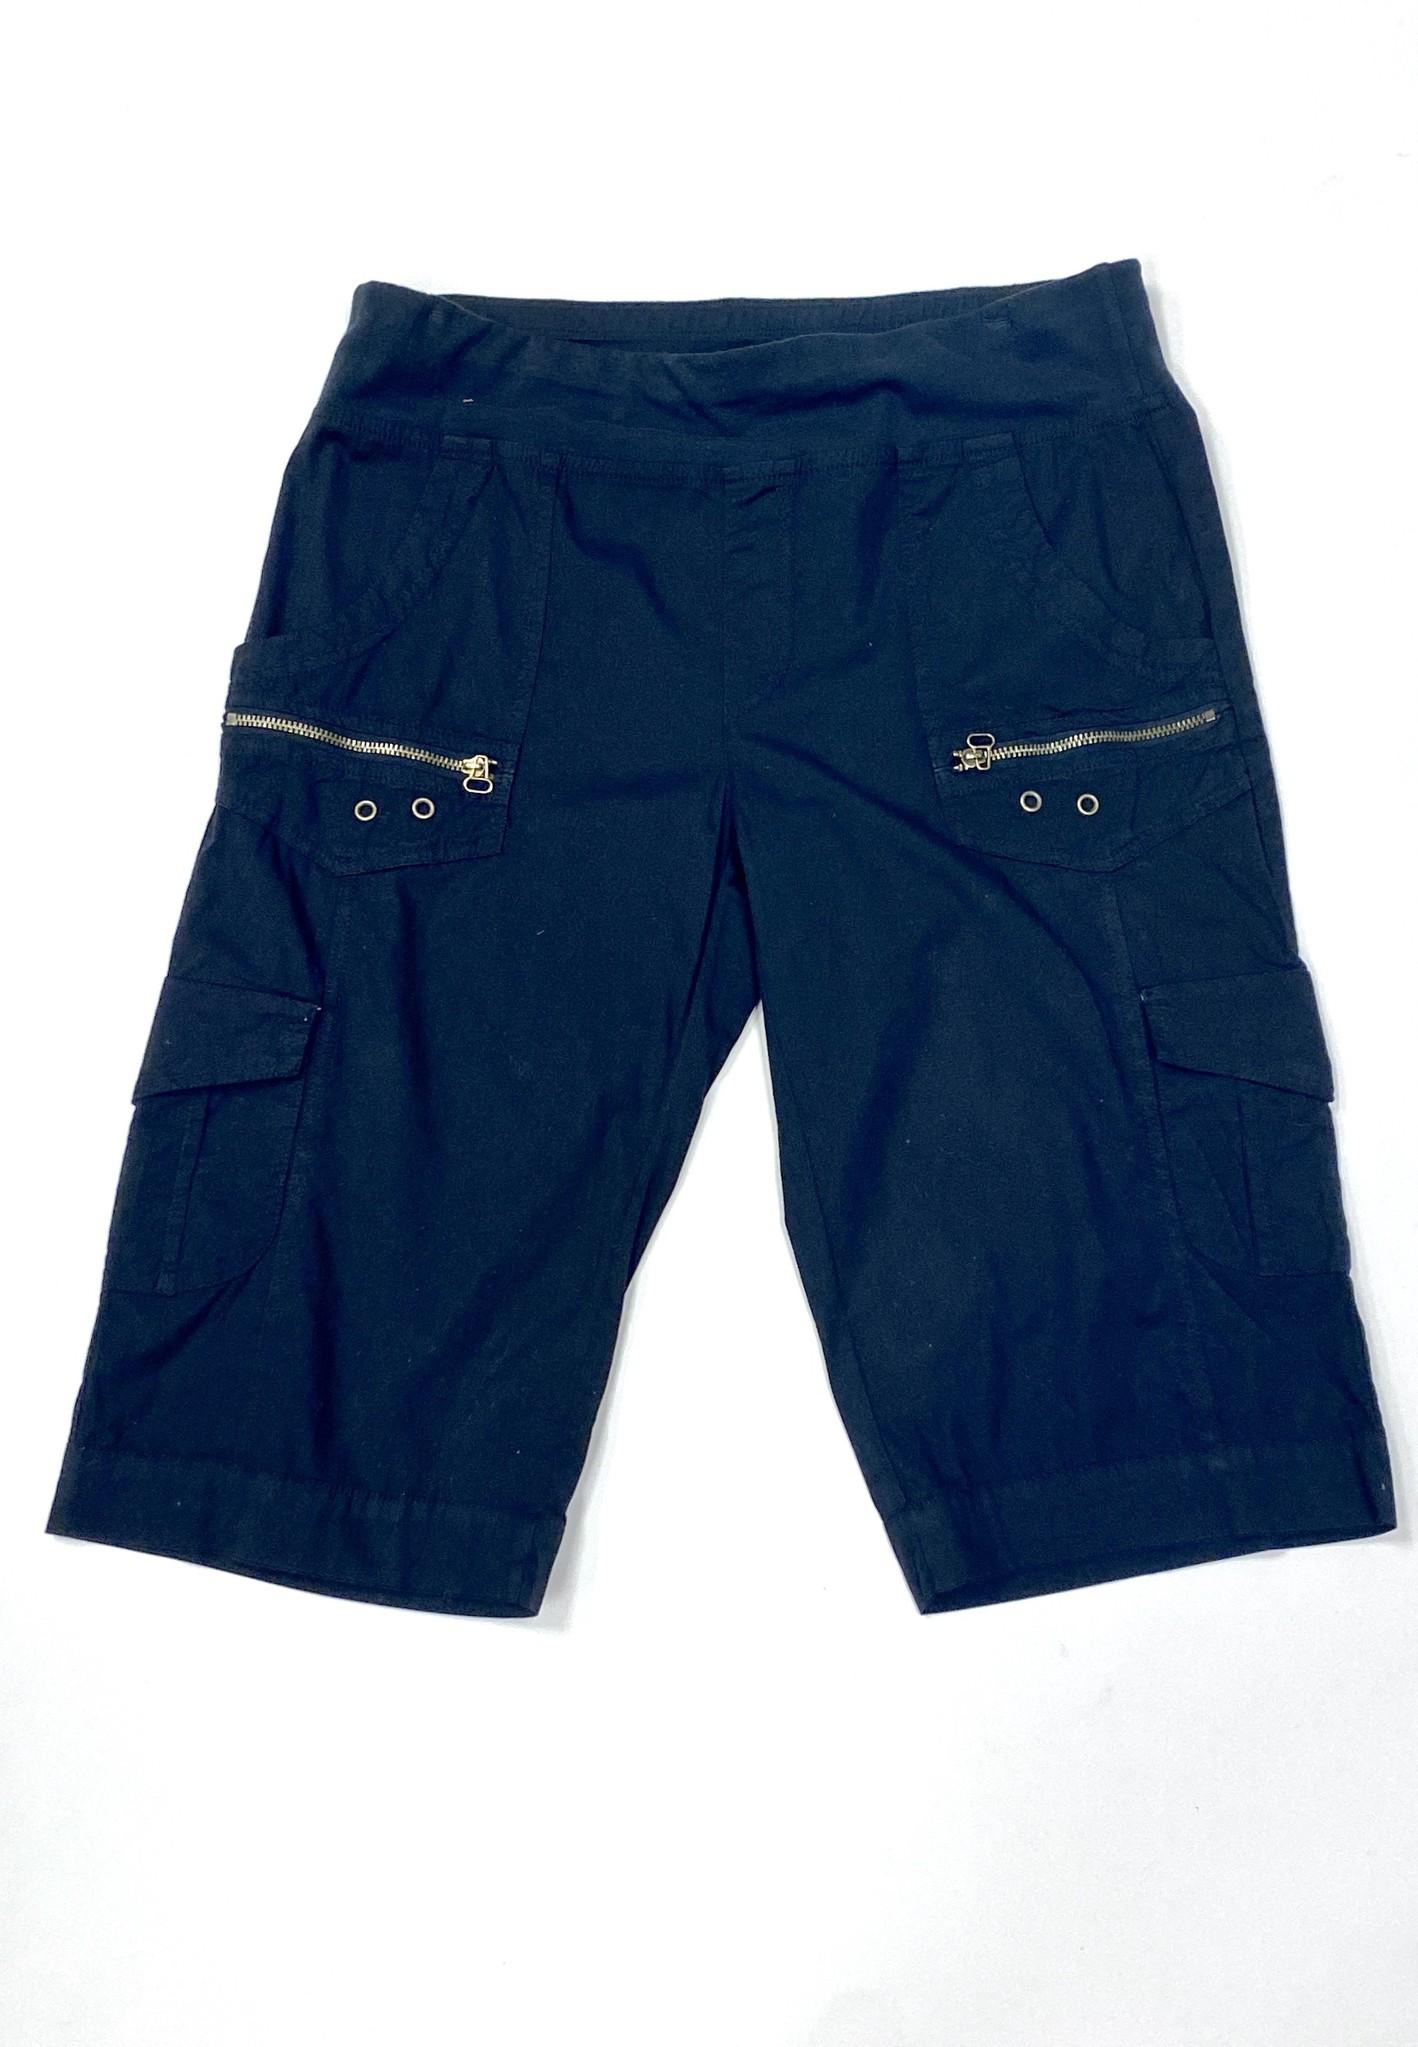 Black Zola Bermuda Shorts